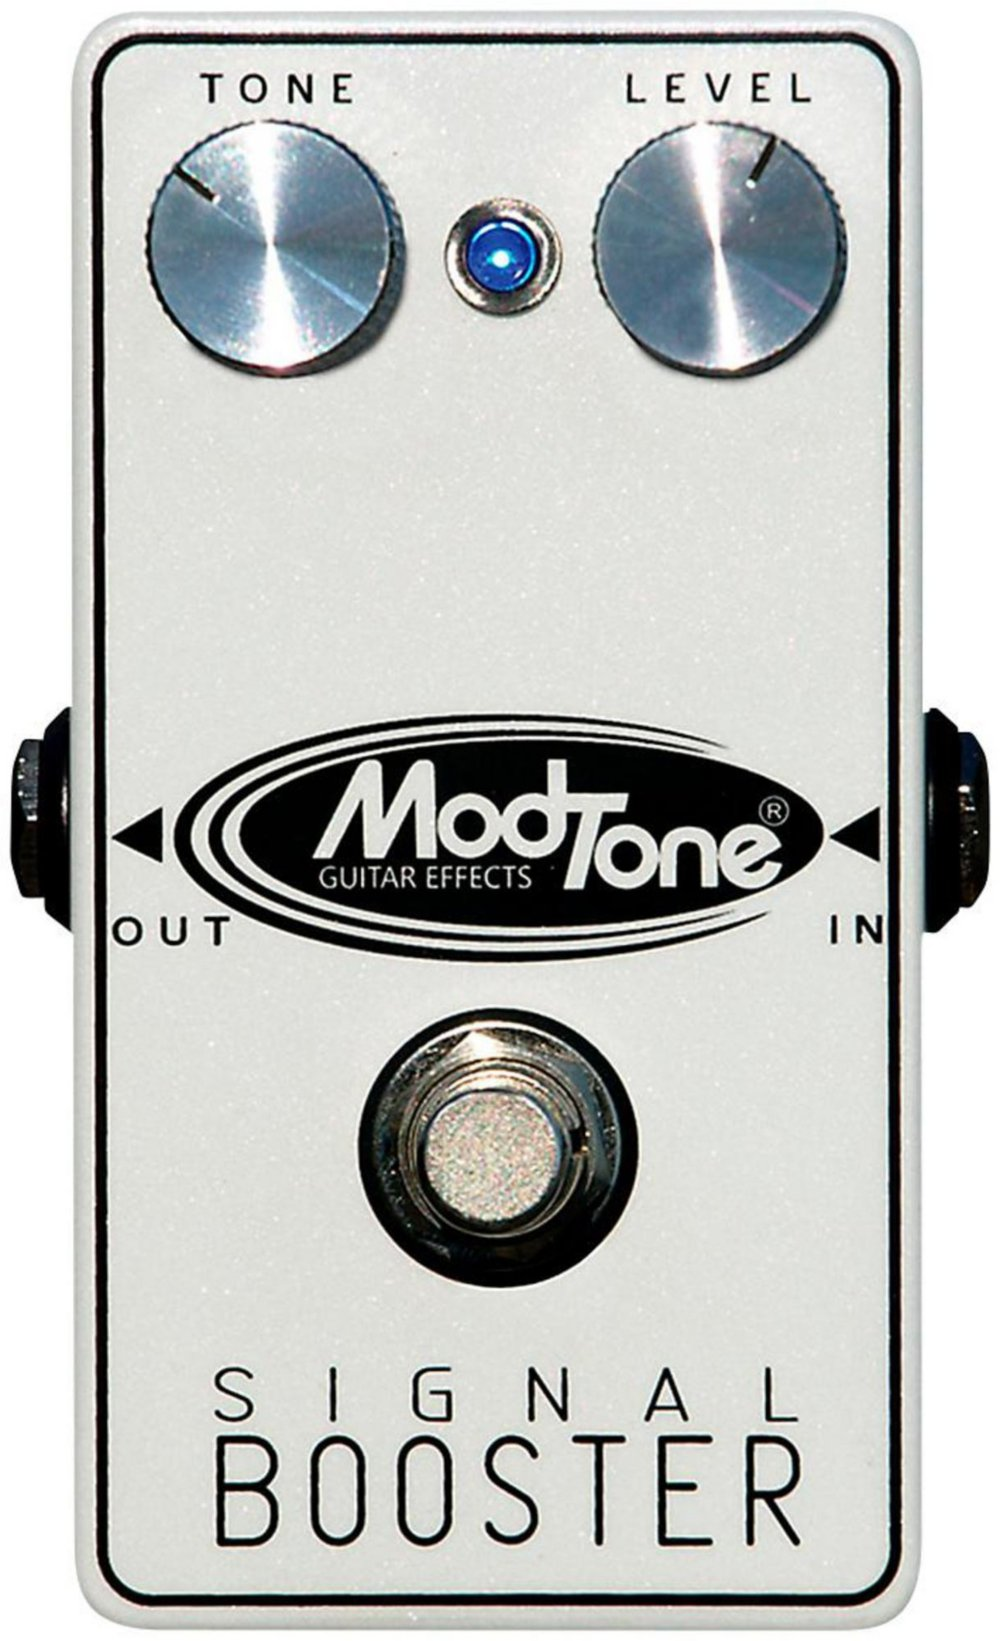 ModTone Guitar Effects MT-SB Pedal Signal Booster by ModTone Guitar Effects